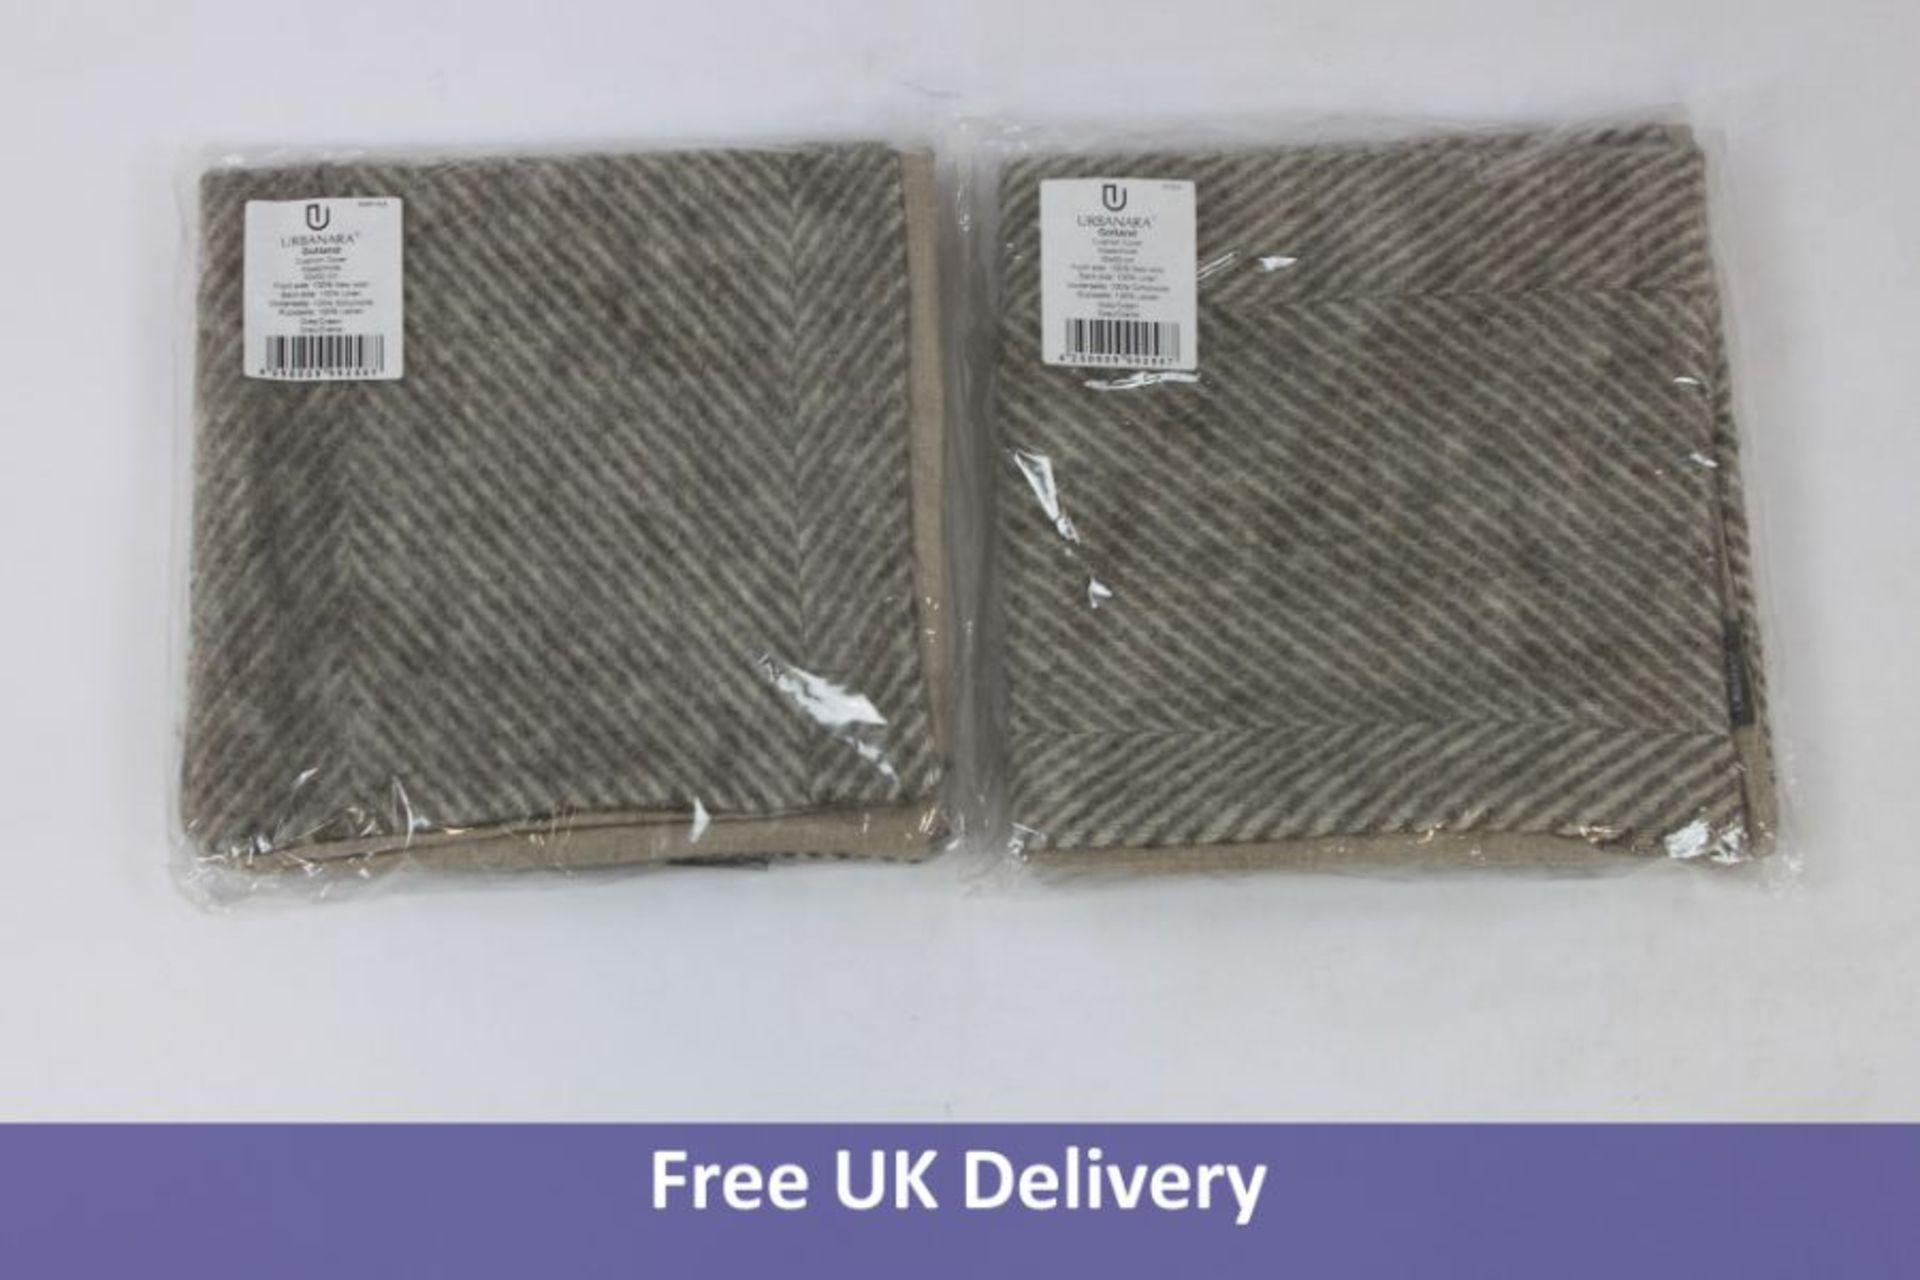 Pair of Urbanara Gotland Cushion Covers, Grey, 50 x 50 cm